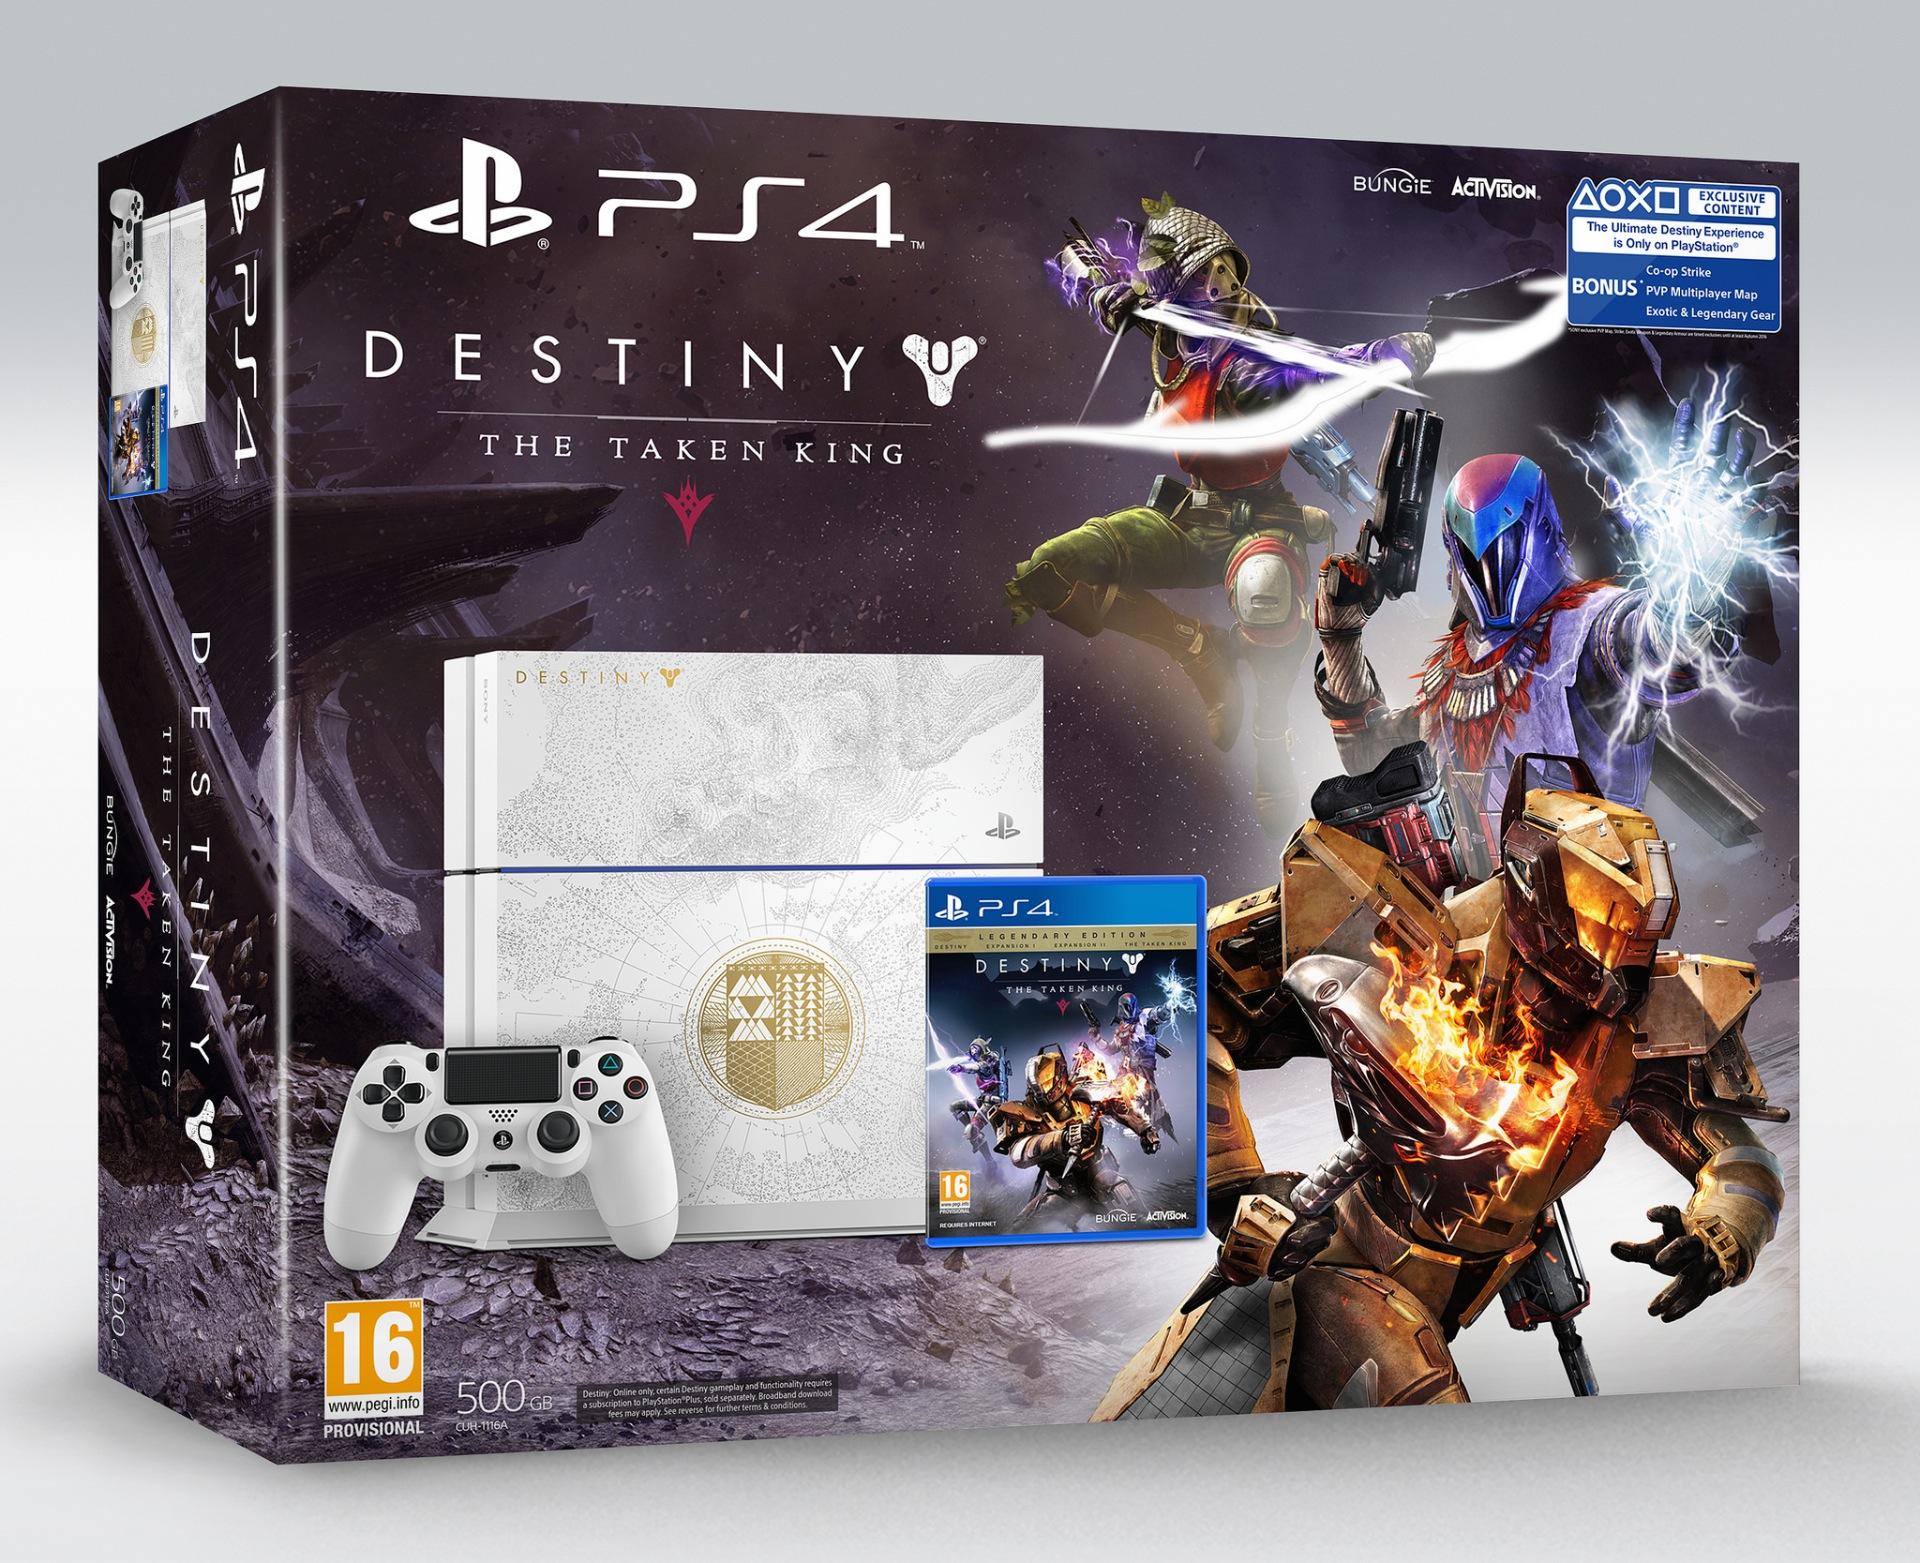 Destiny: The Taken King Limited Edition PS4 Bundle ...